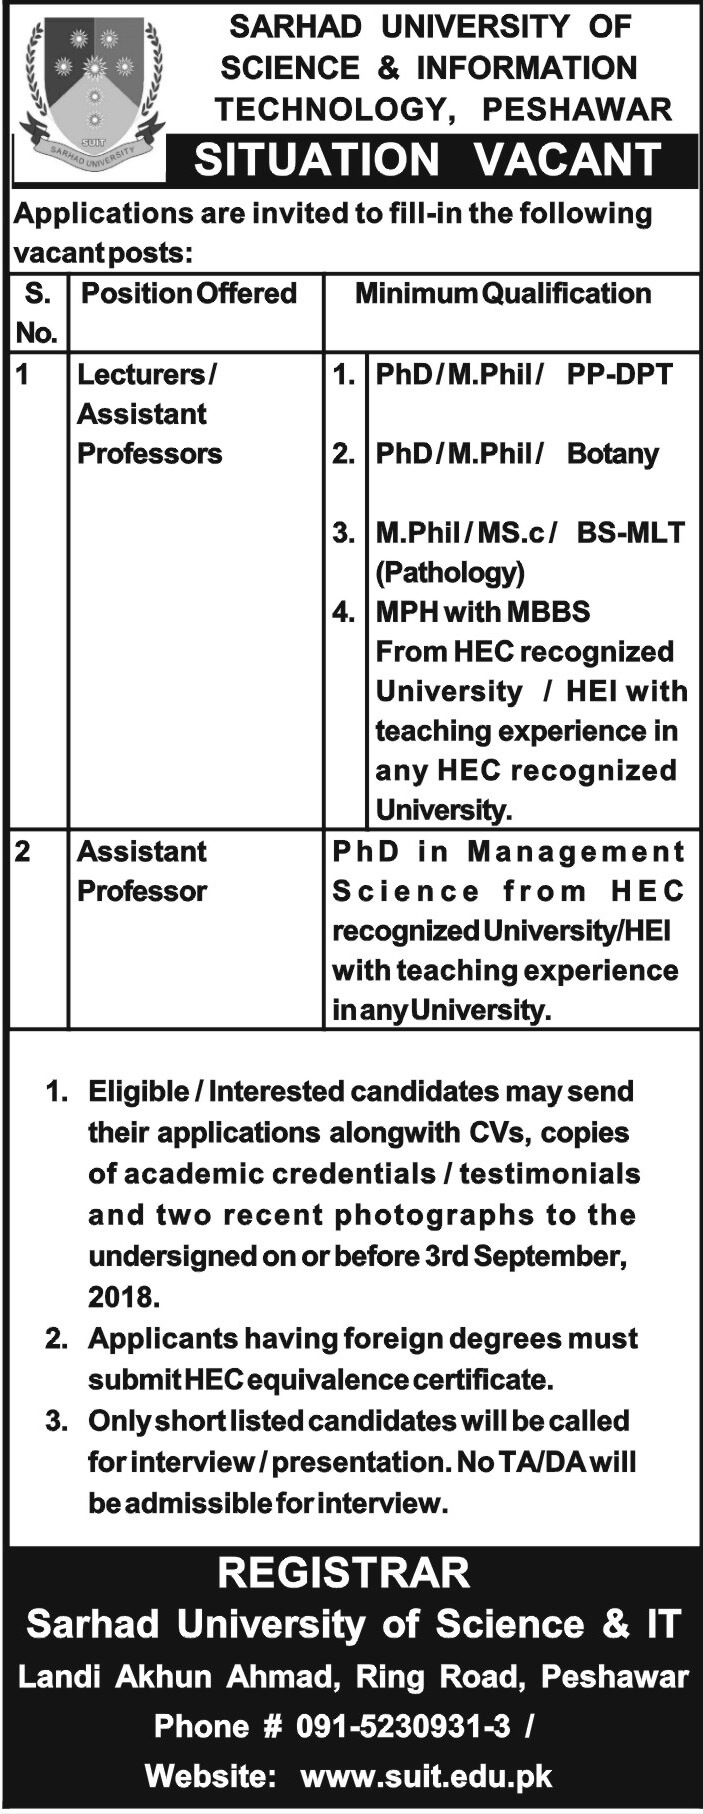 Sarhad University of science and Information Technology Peshawar Latest Jobs 2018 -thumbnail